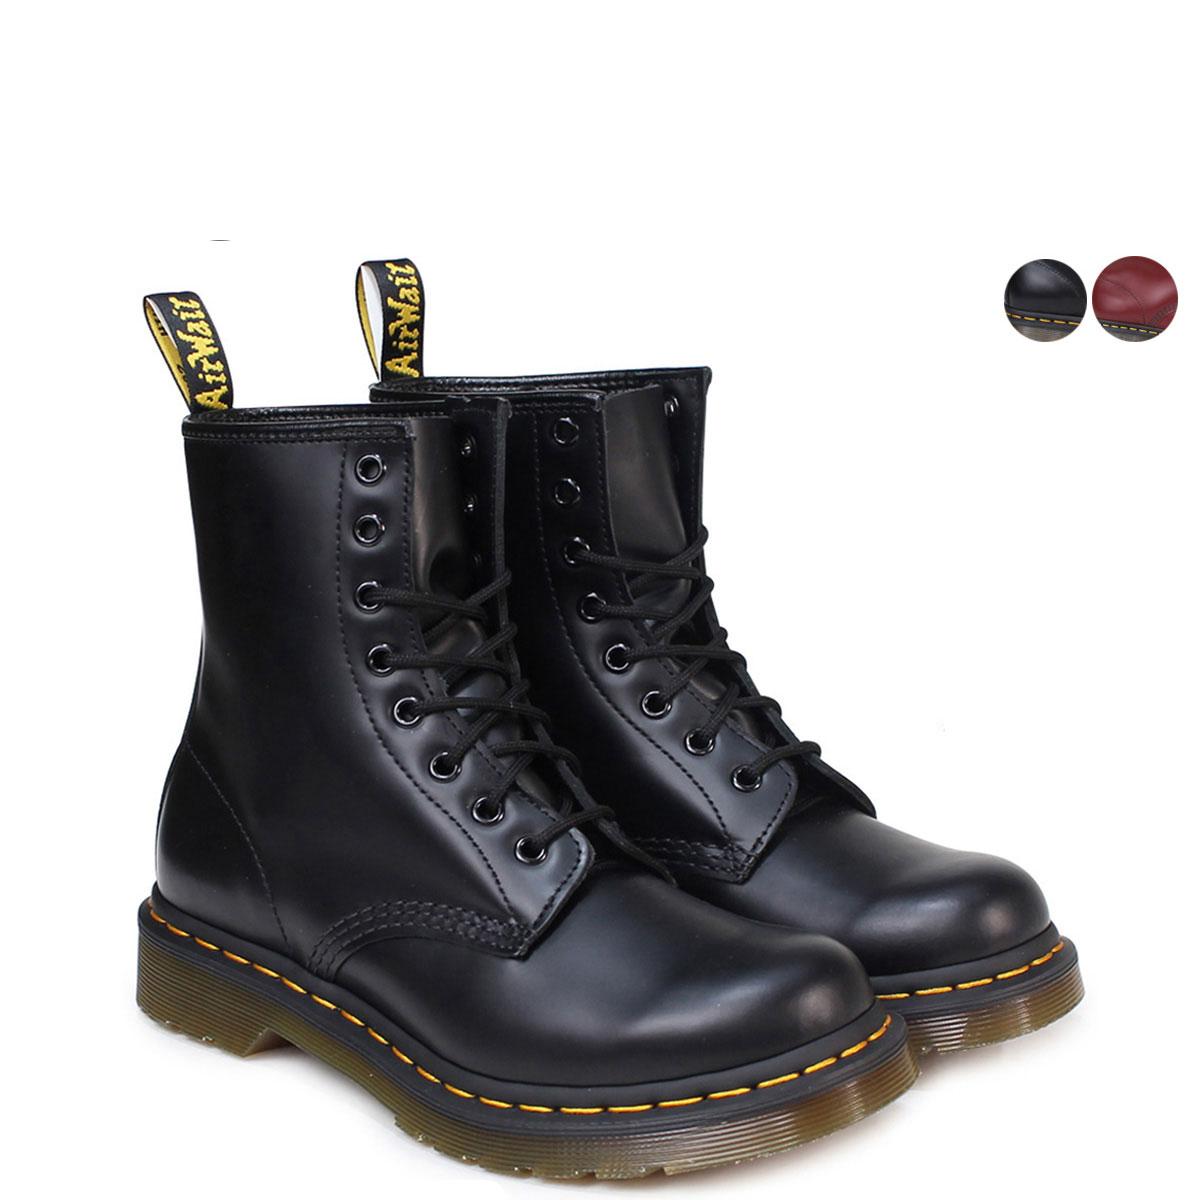 683eca144d Dr.Martens Dr. Martens 1460 8 hole boots ladies WOMENS 8EYE BOOT R11821006  R11821600 ...